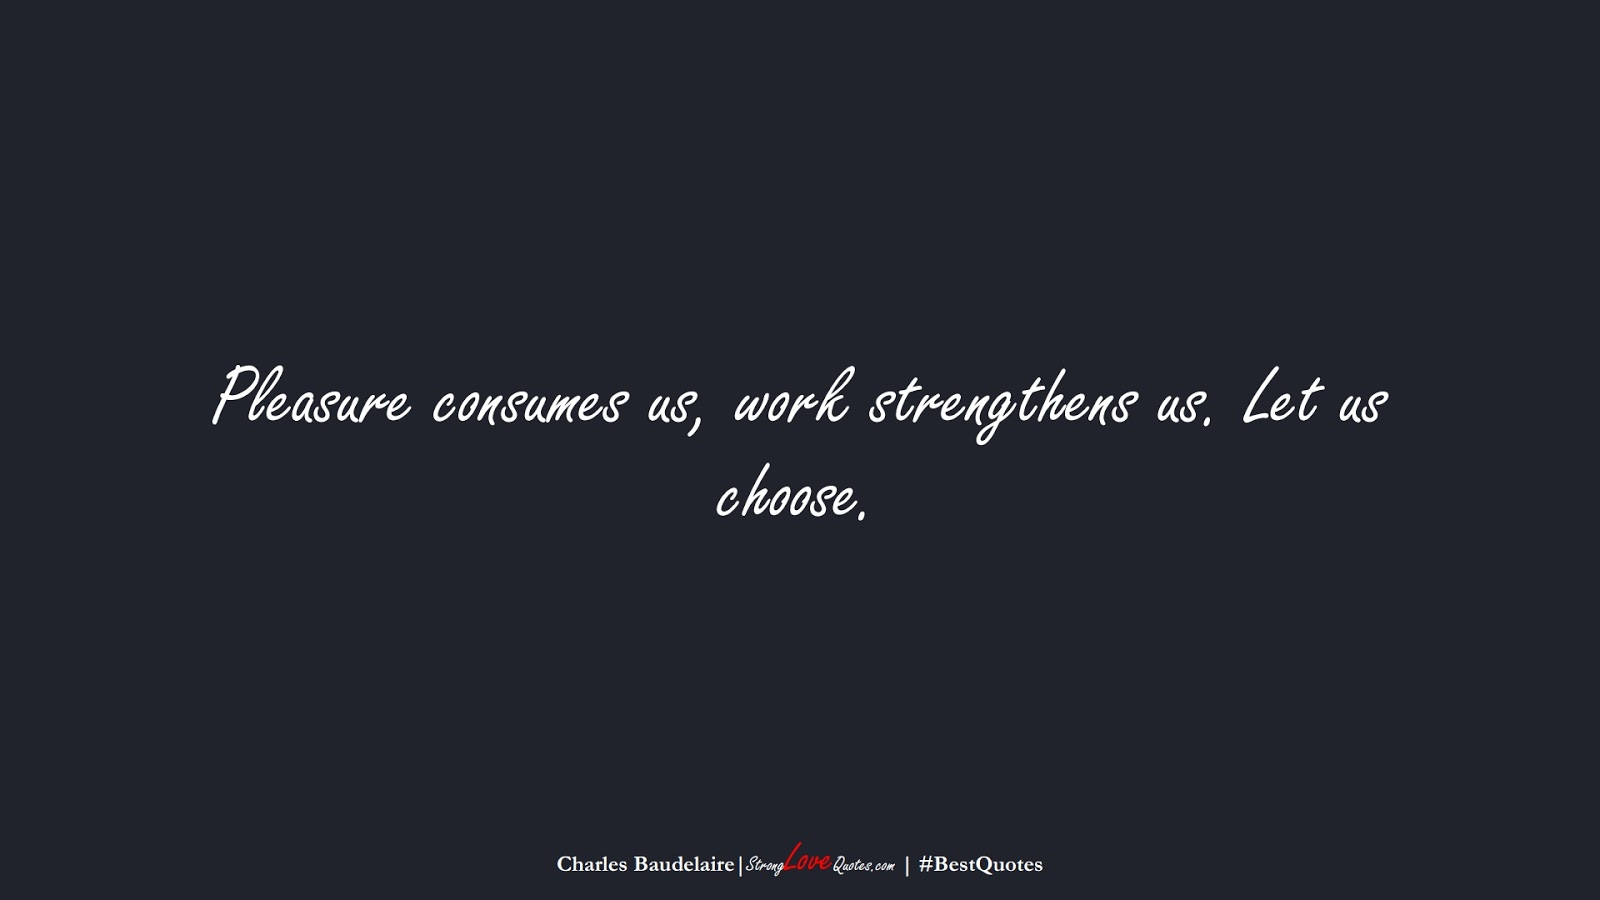 Pleasure consumes us, work strengthens us. Let us choose. (Charles Baudelaire);  #BestQuotes